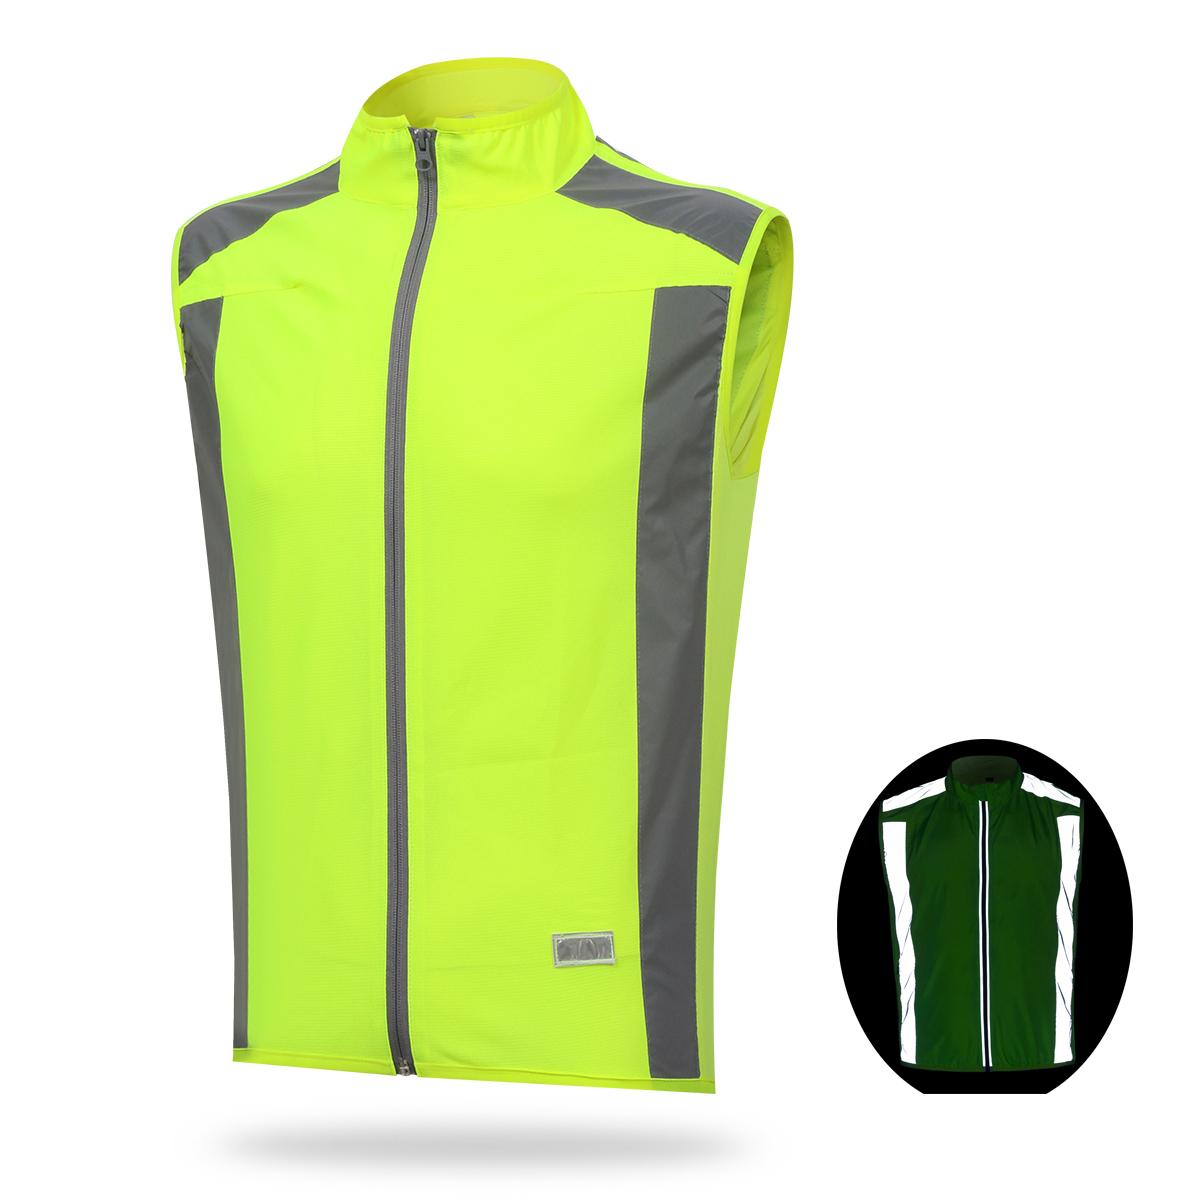 new reflective safety cycling vest running jogging sports windbreaker size s 3xl ebay. Black Bedroom Furniture Sets. Home Design Ideas